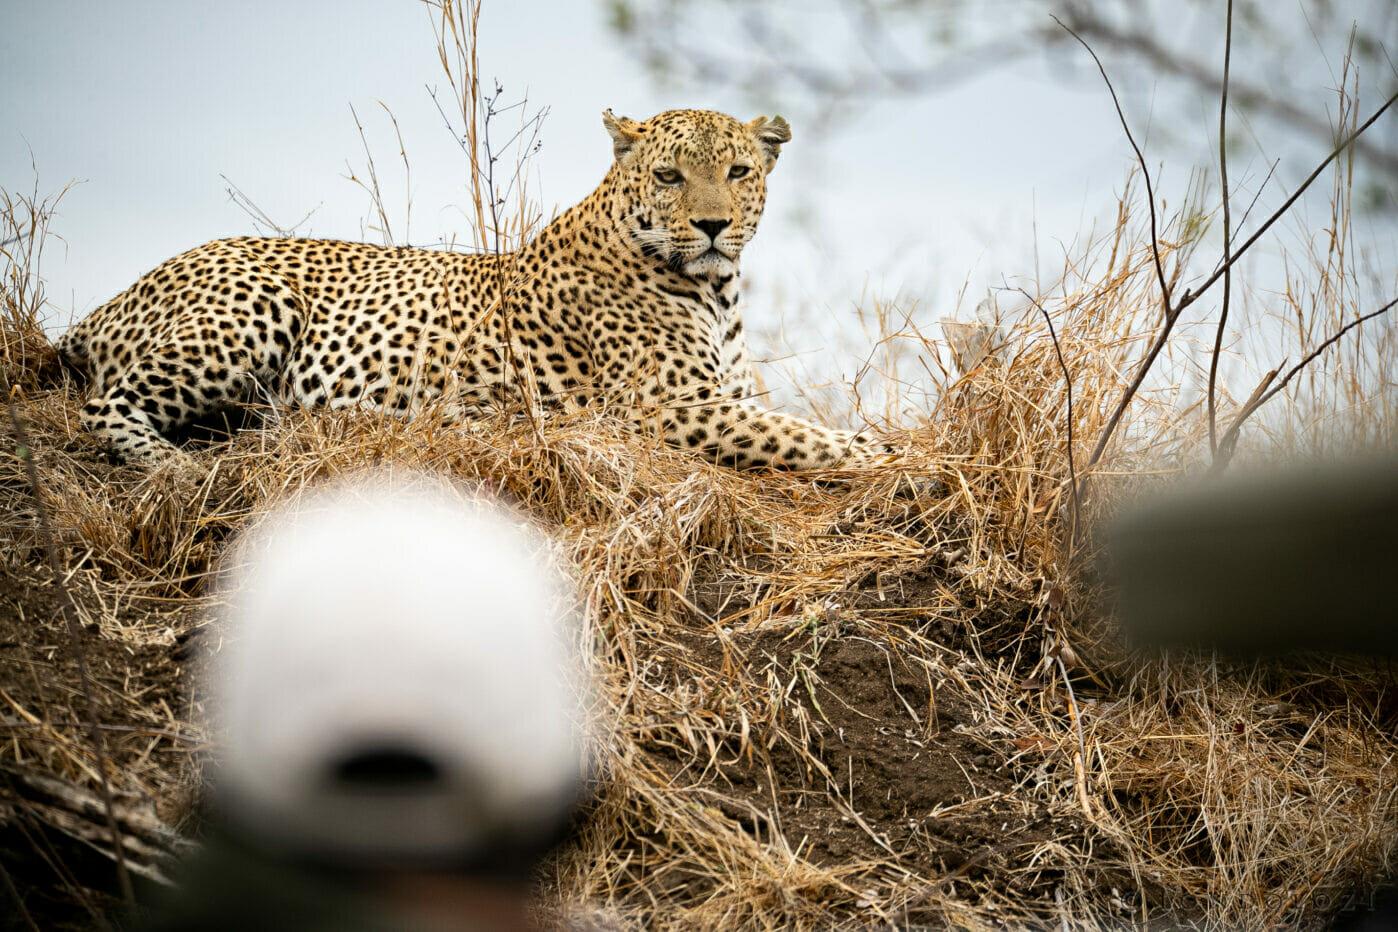 Sdz Senegal Bush Male Leopard Termite Mound Sersant Foreground